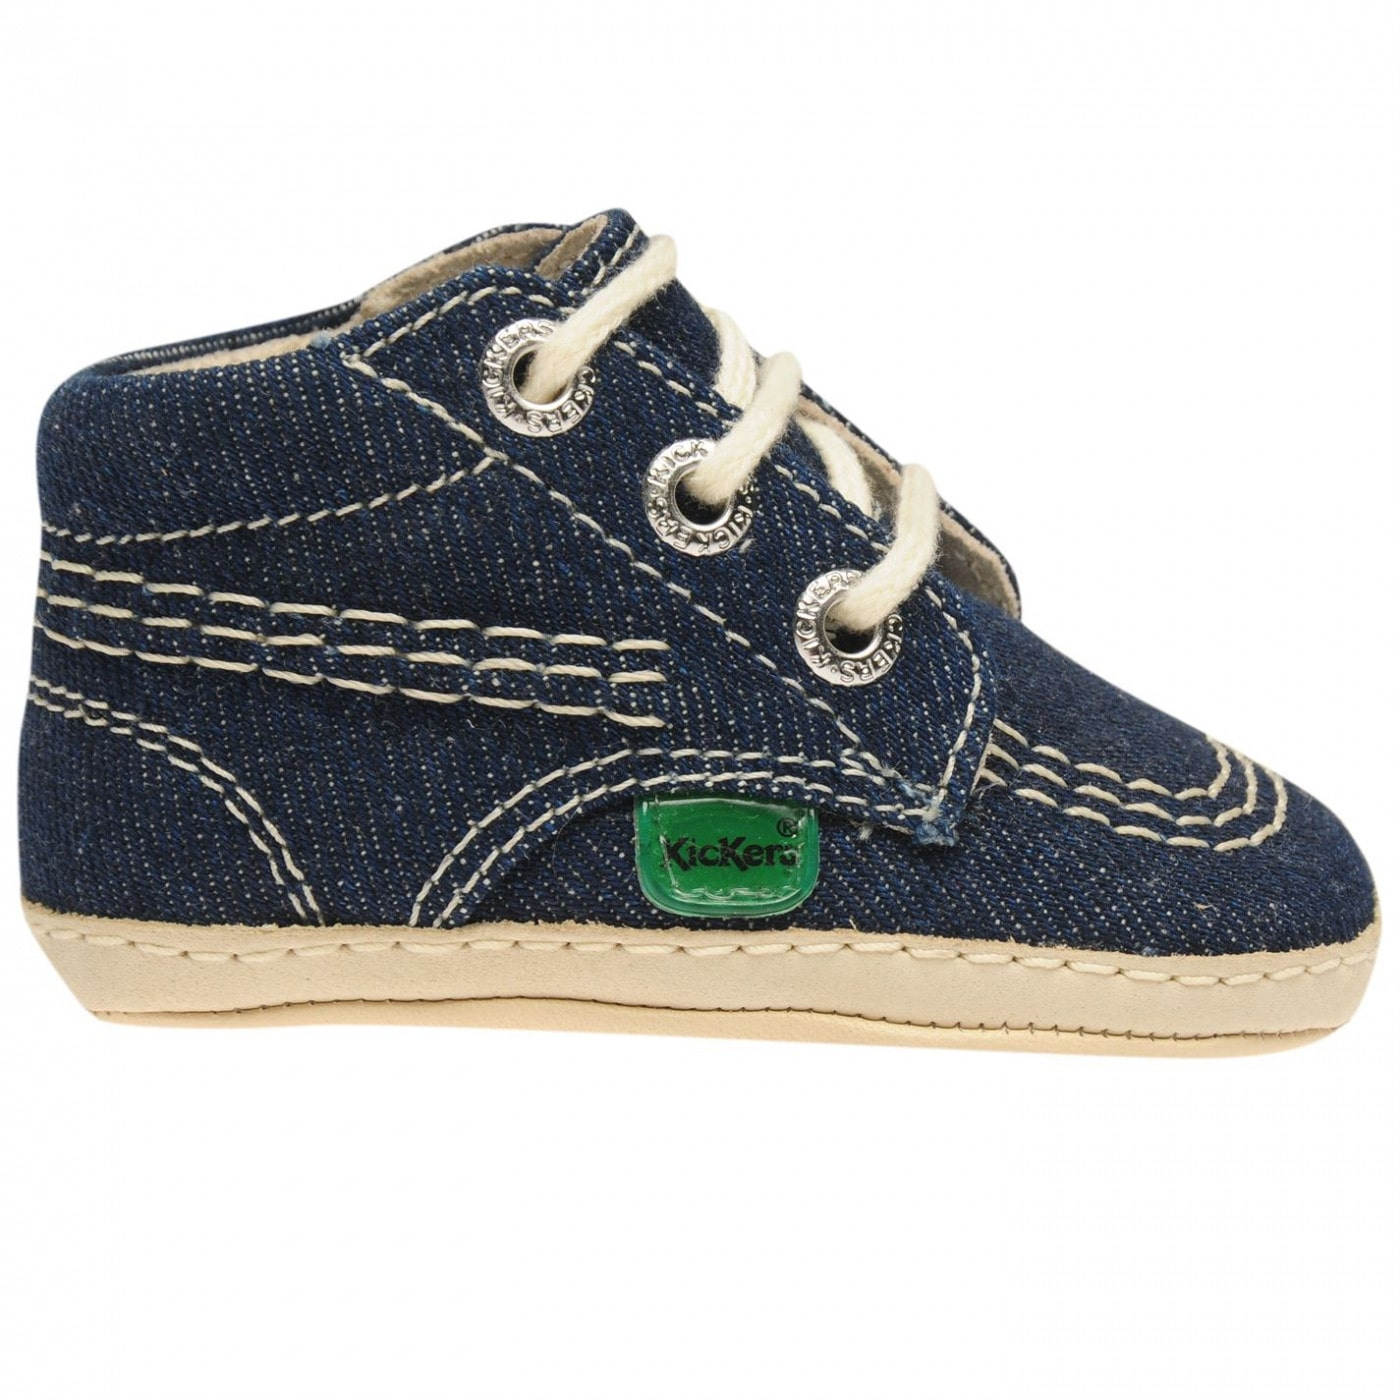 Kickers 1st Text Baby Boys Crib Shoes